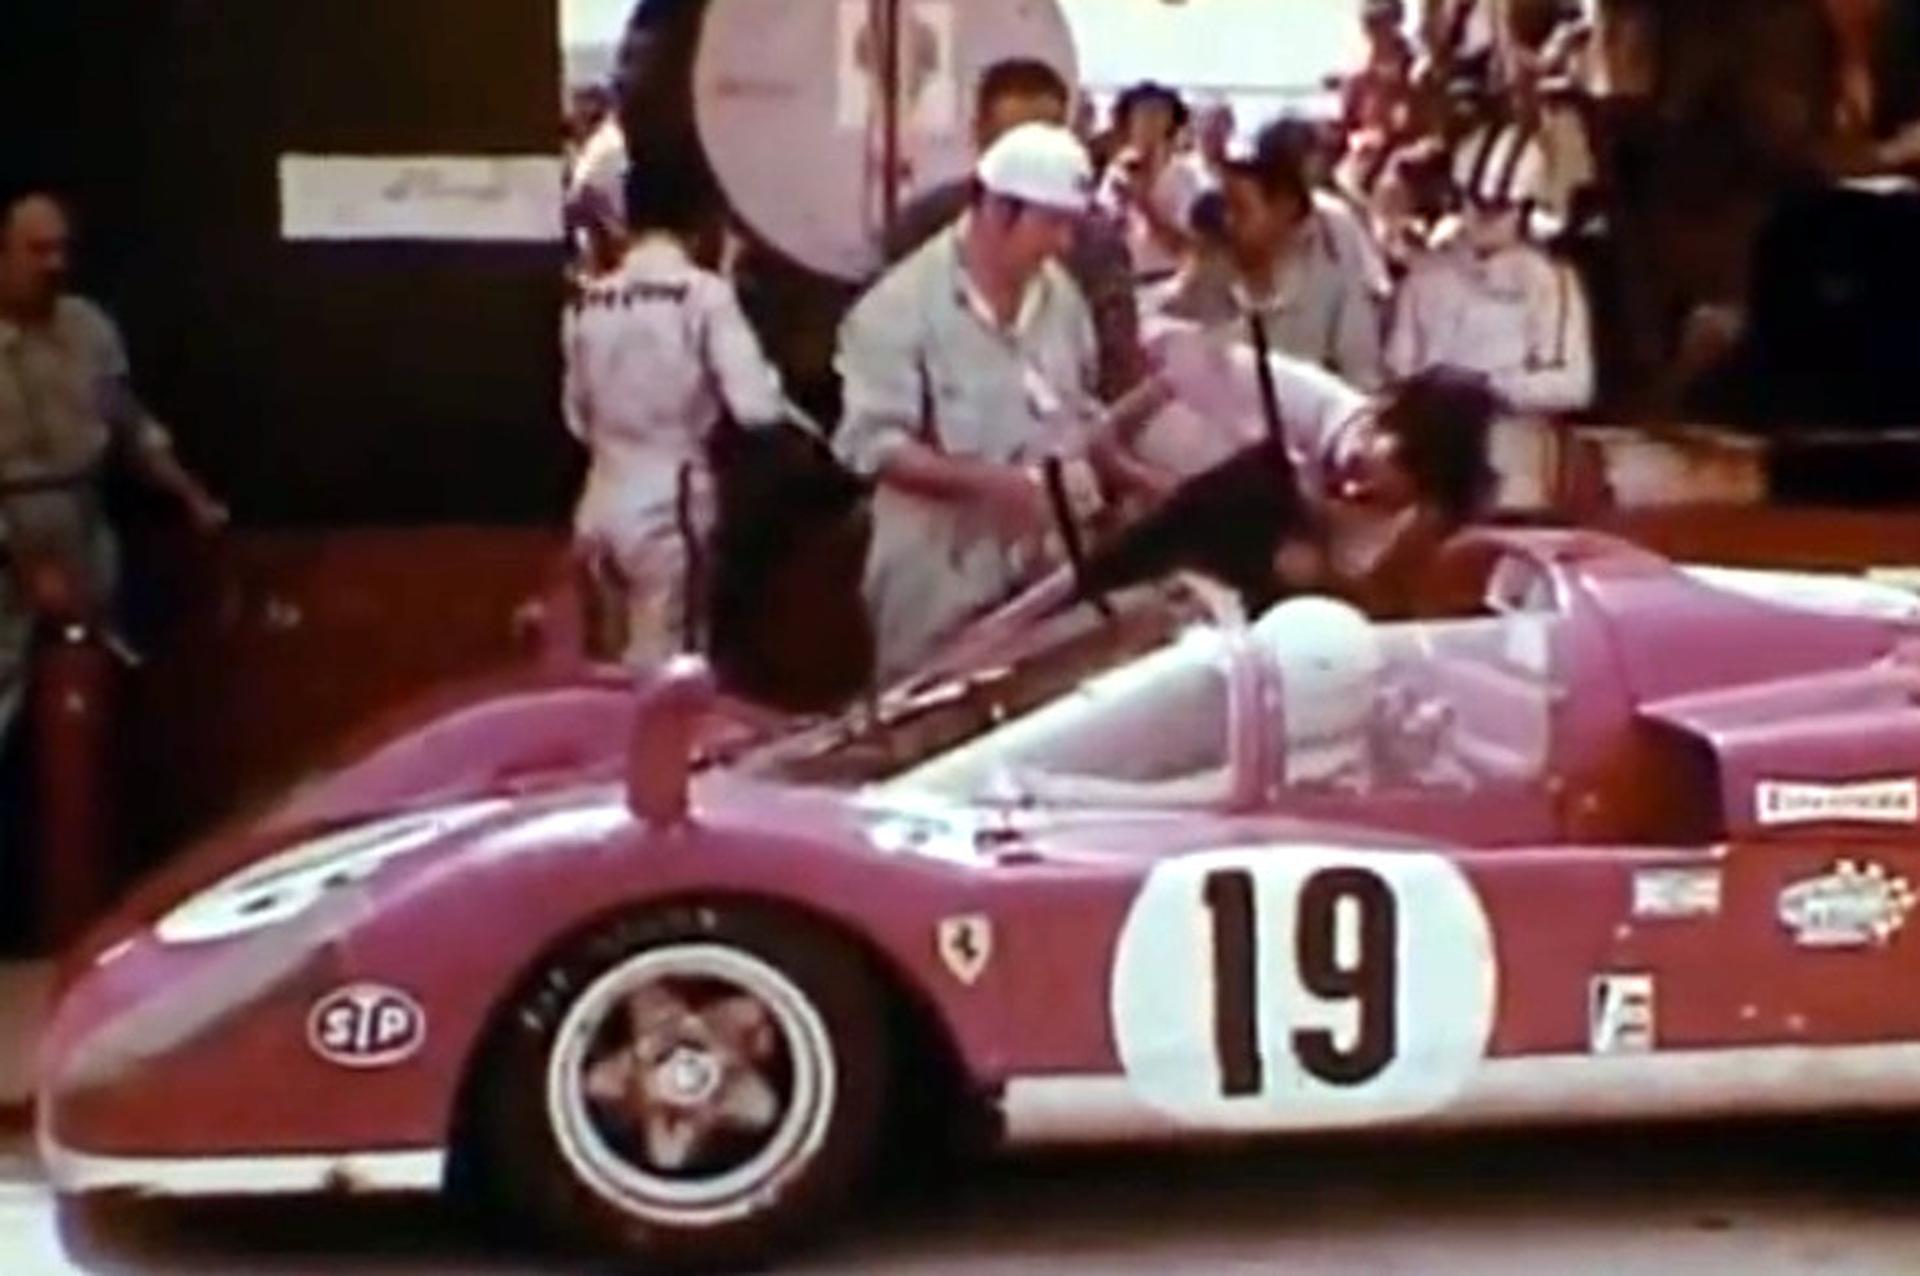 Vintage Sebring Footage Gets Us Pumped for Saturday's TUDOR Race [video]